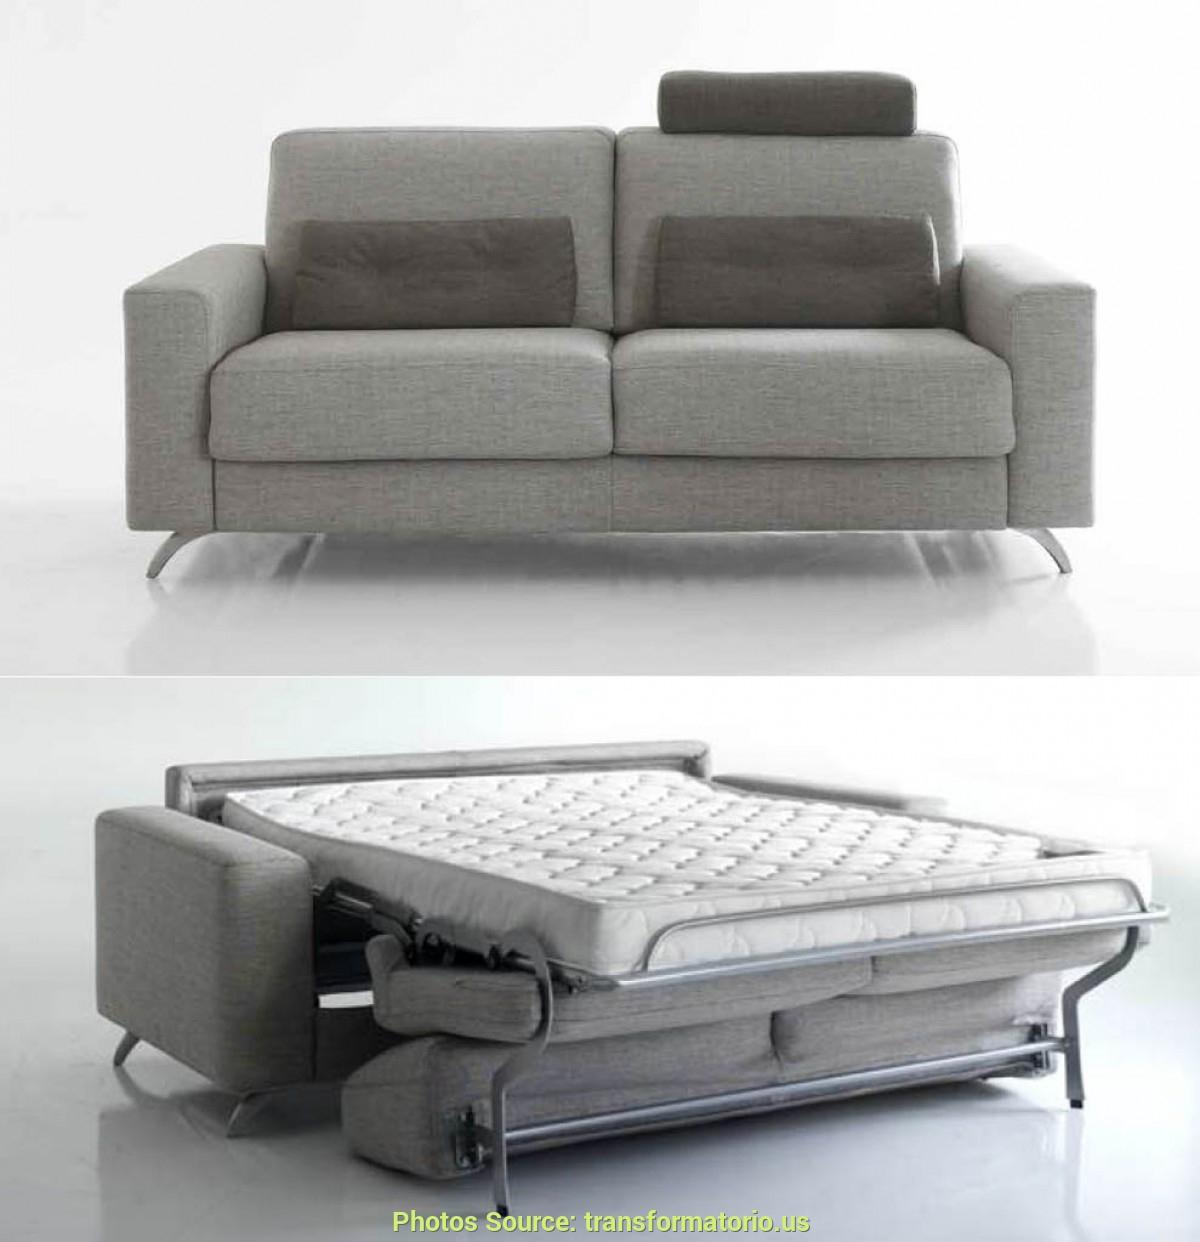 Canape D'Angle Convertible Couchage Quotidien 160X200 ... serapportantà Bz 160X200 Ikea